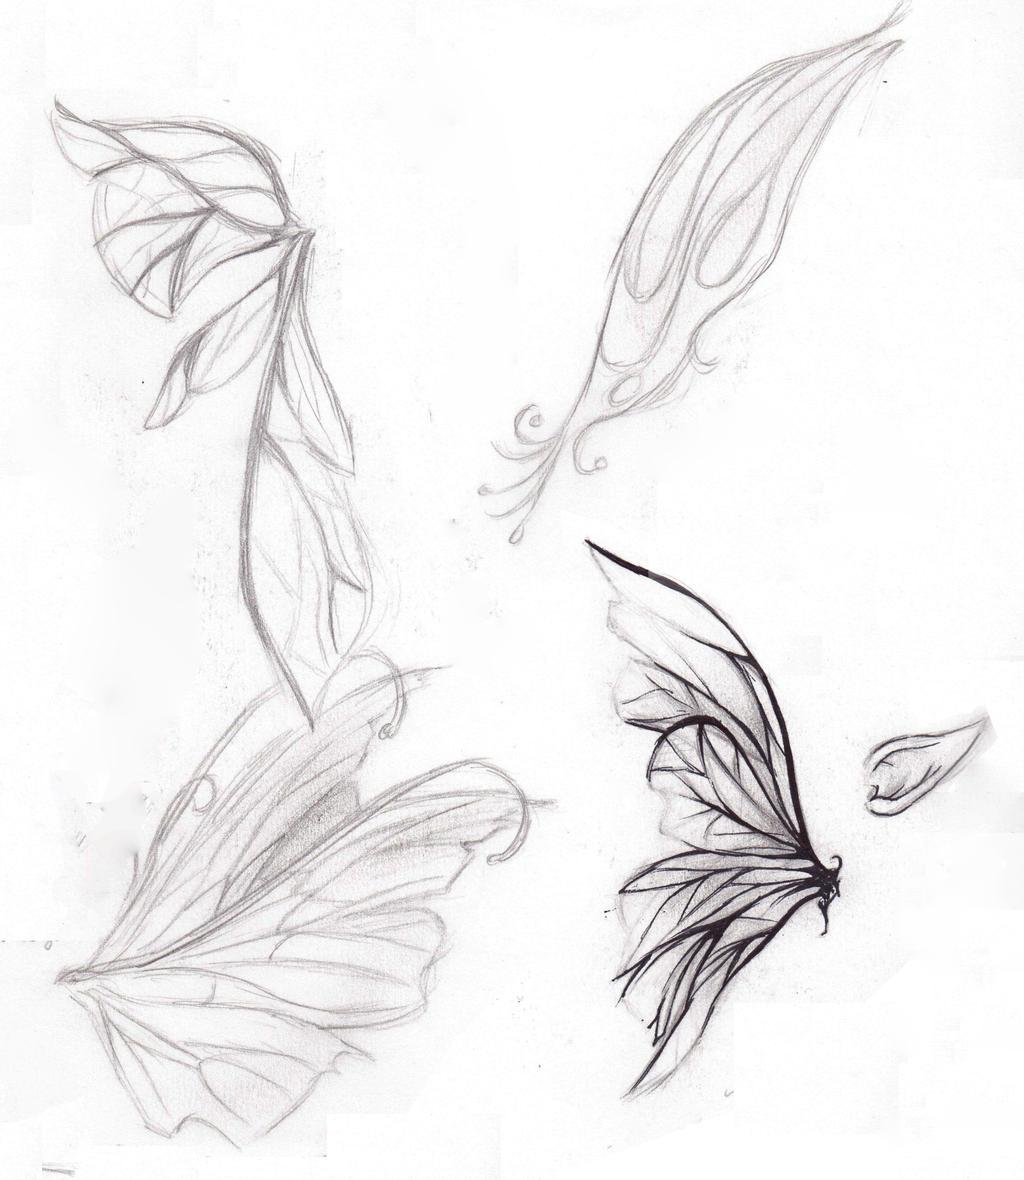 Fairy Wings by Leesa-Mia on DeviantArt